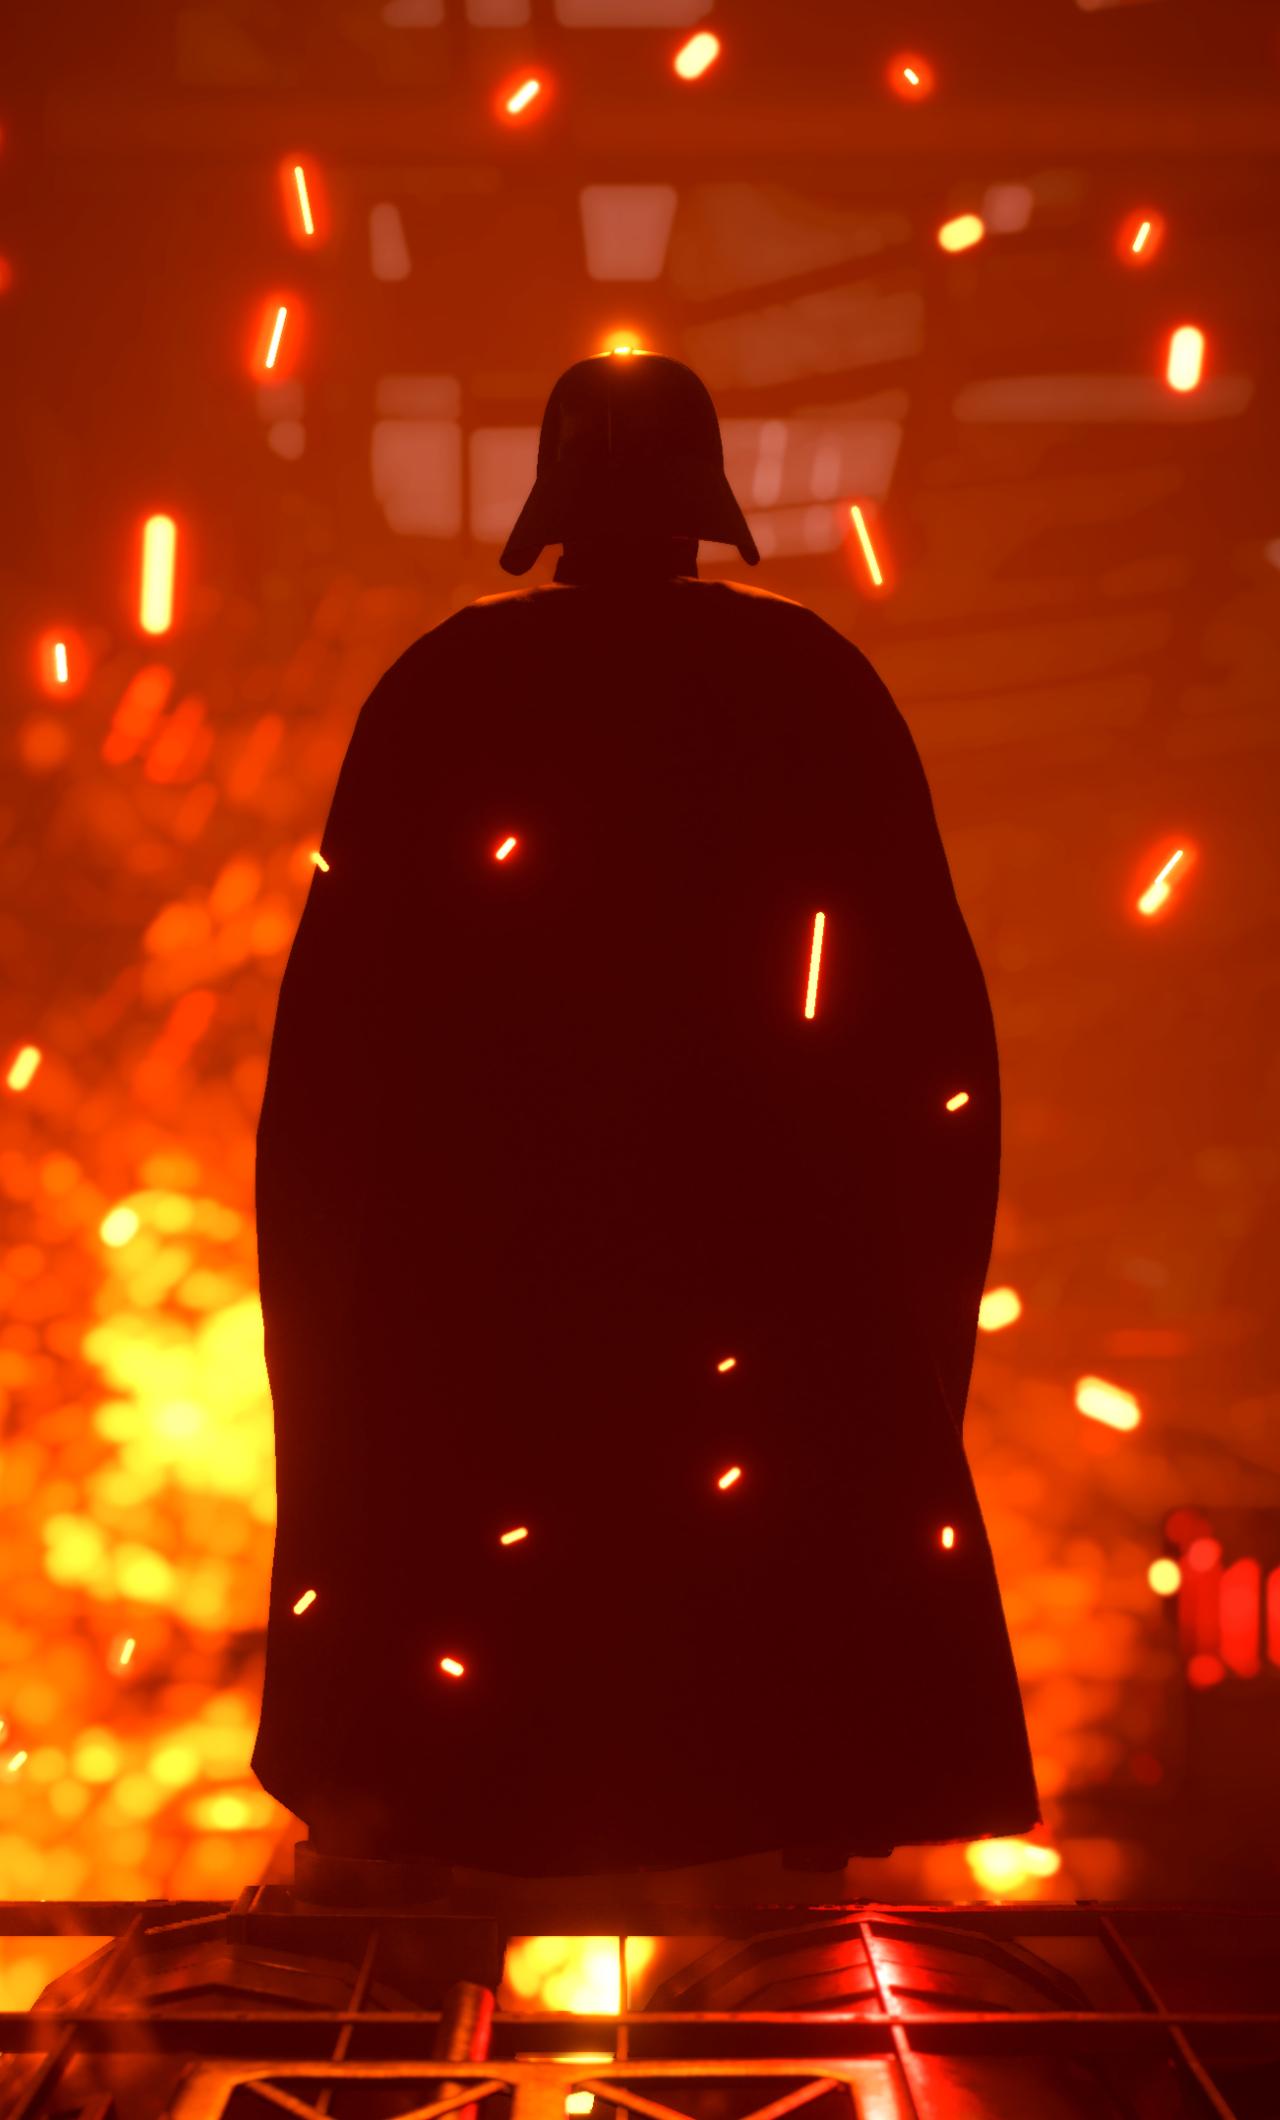 1280x2120 Darth Vader Iphone 6 Plus Wallpaper Hd Movies 4k